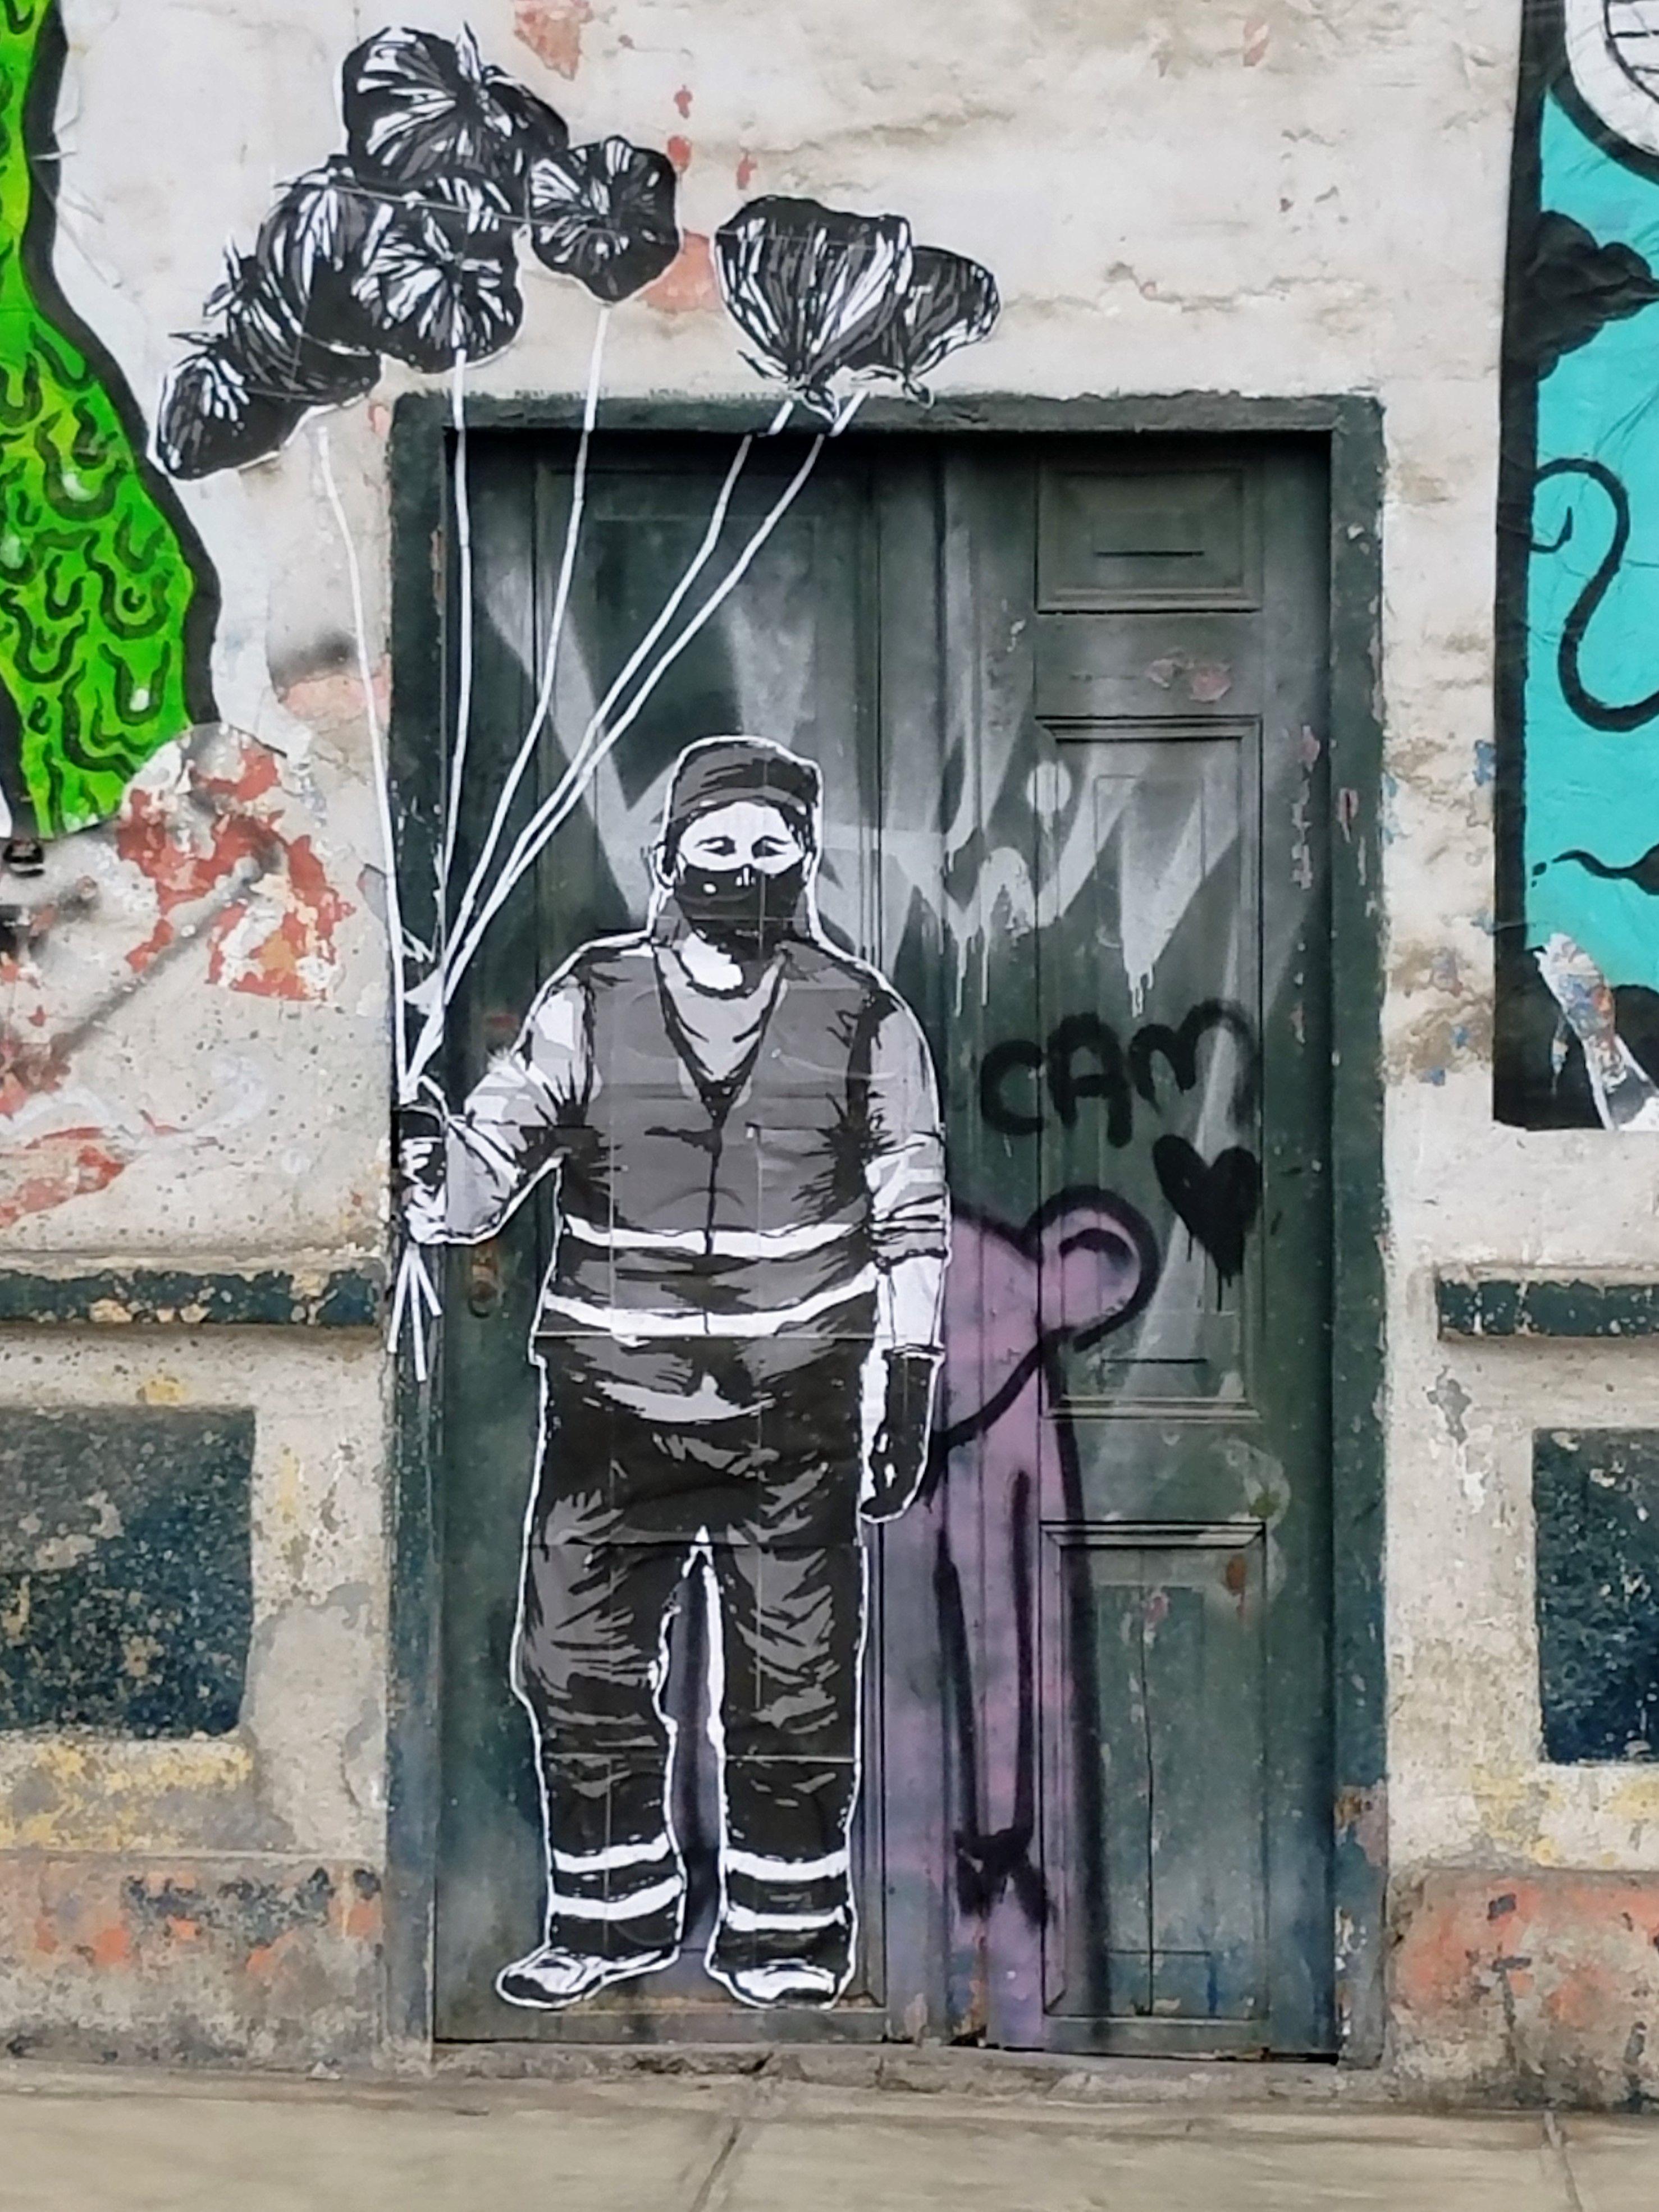 Street Art Graffiti Lima Peru This From The Barranco District